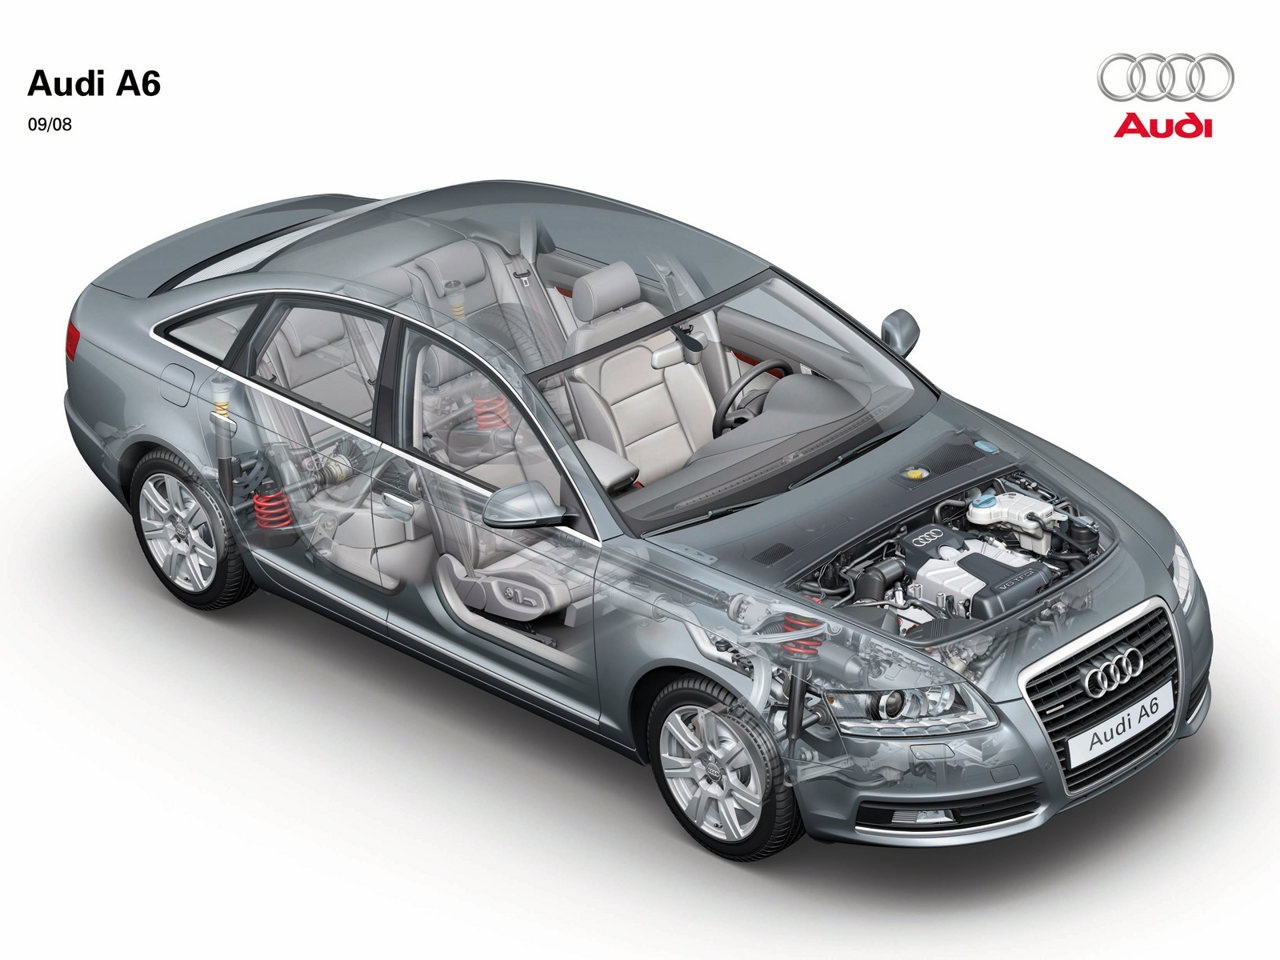 Audi A6 C6 Awarie I Problemy Autokultpl